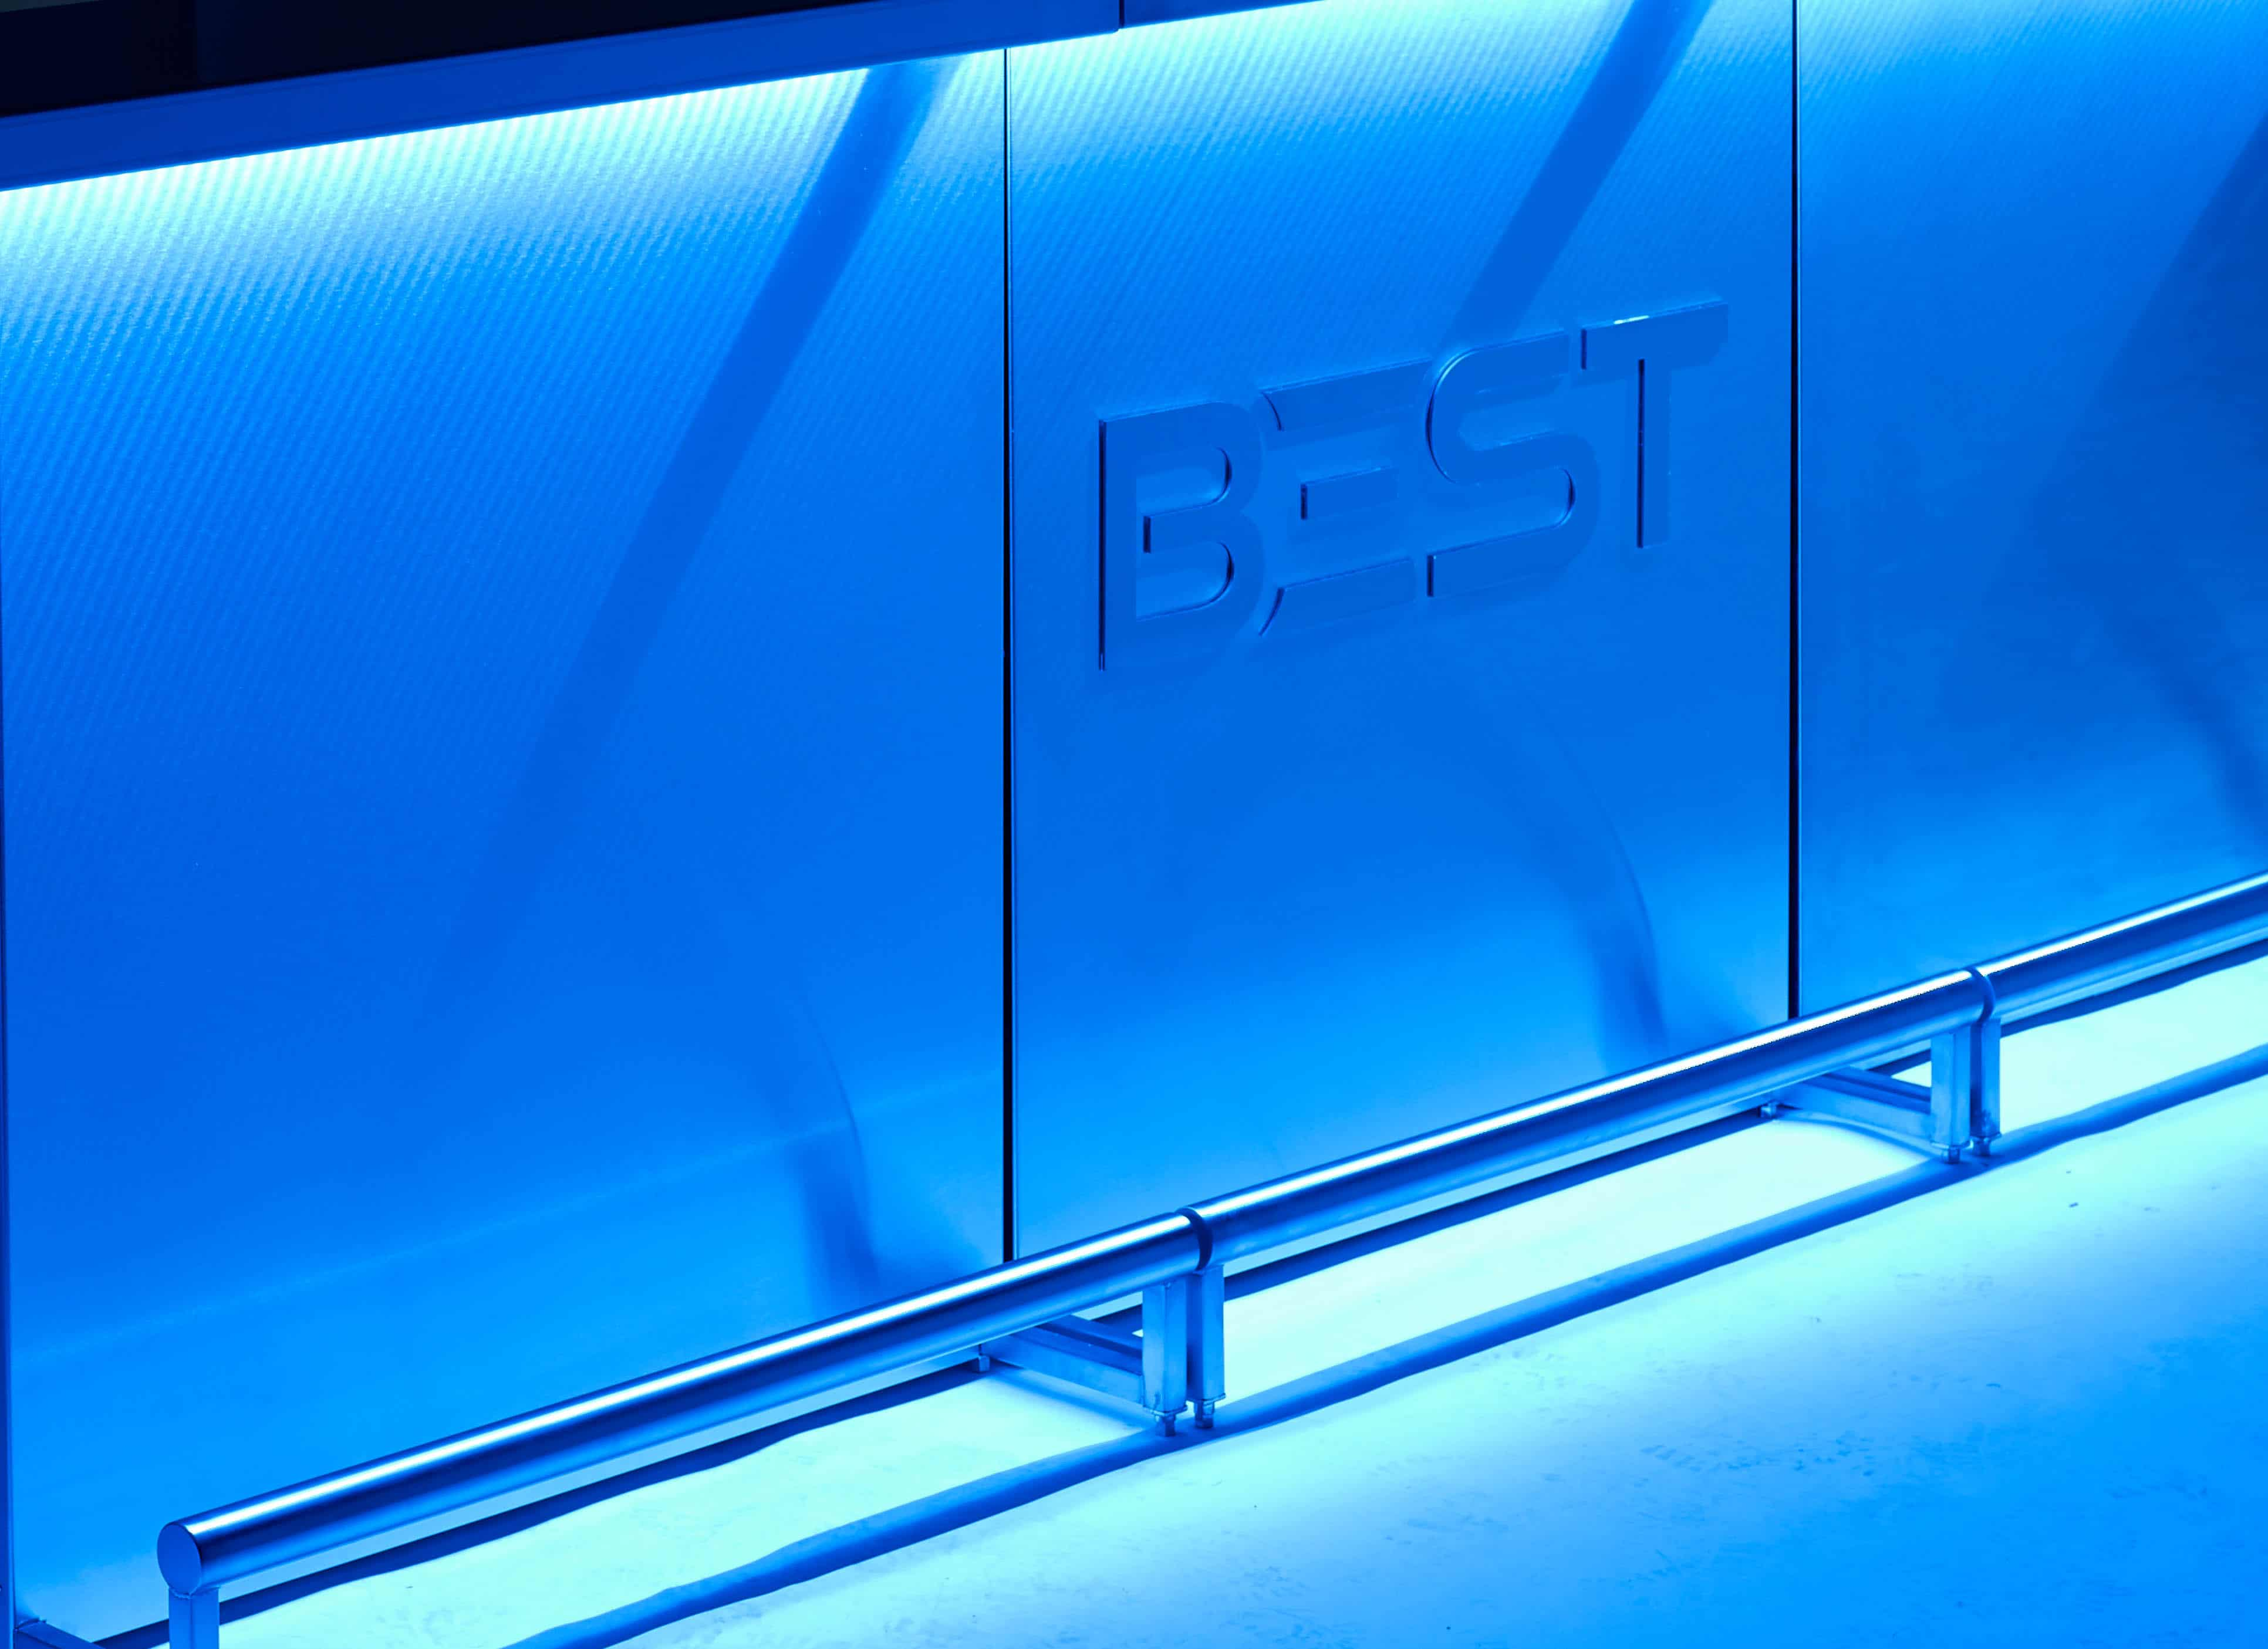 BEST-3-Bars-Blue-Light-Intro